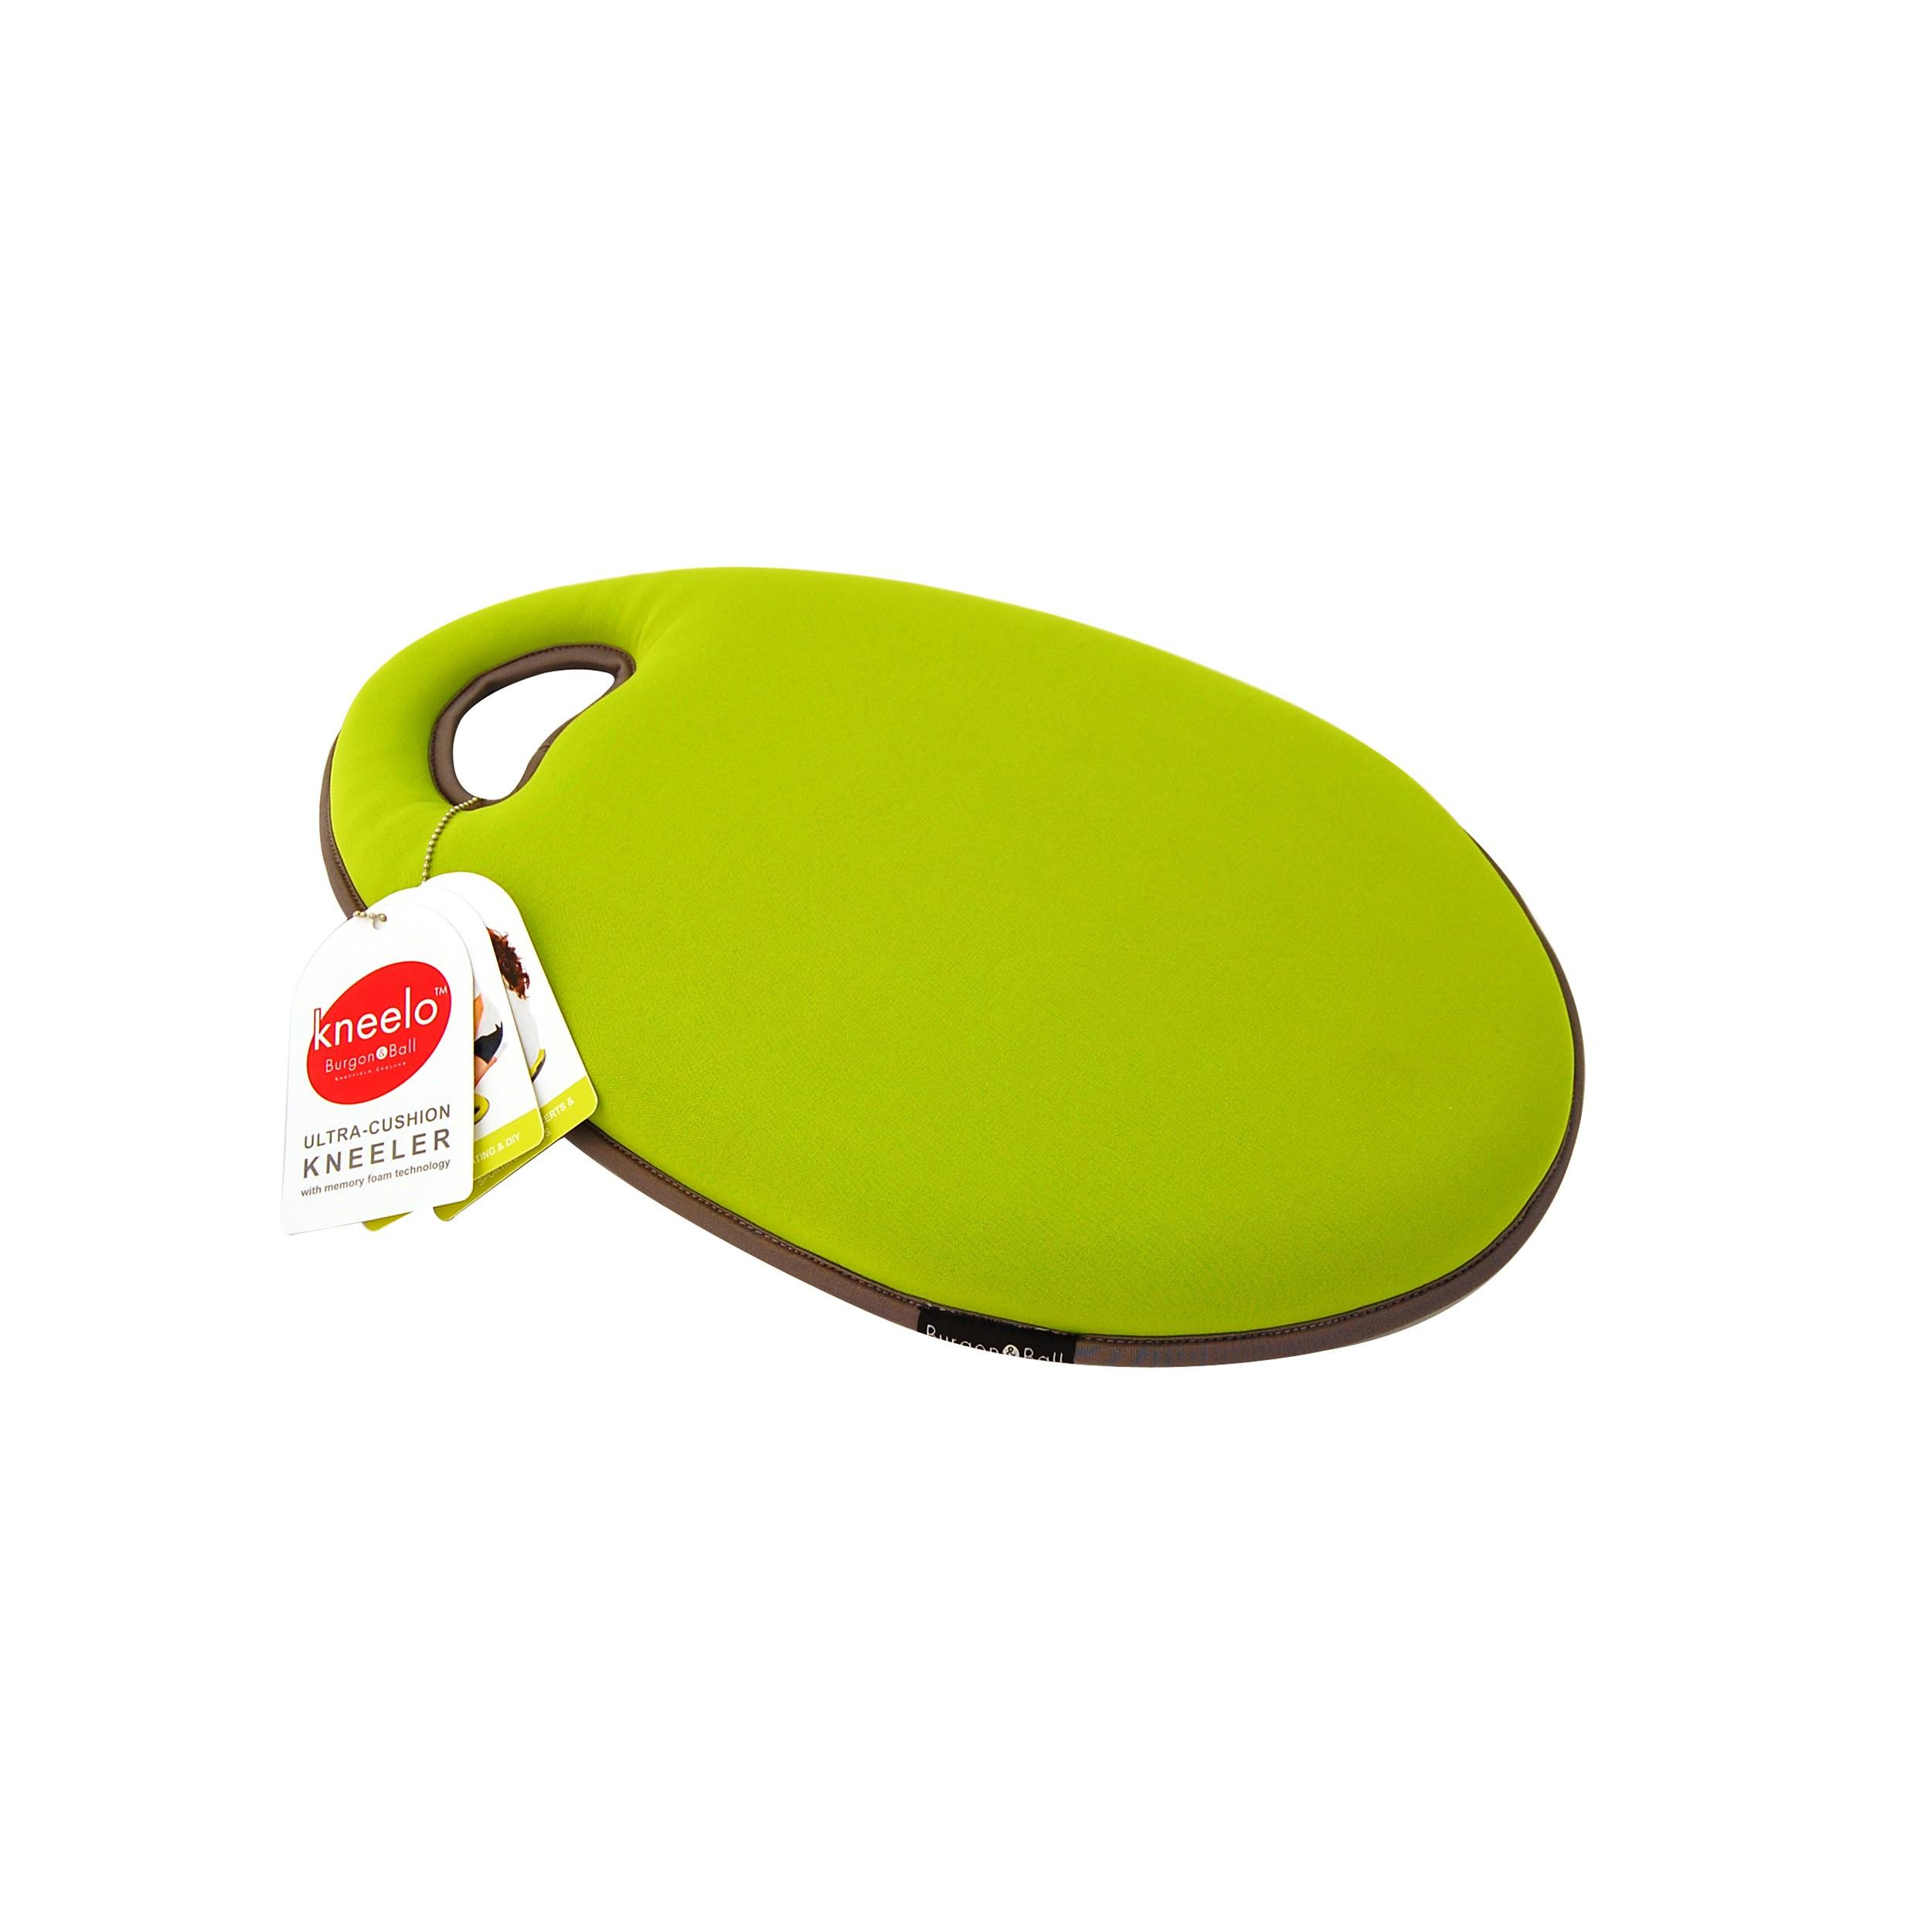 kniekissen kneelo kniepolster knieschutz kniematte knieschoner burgon ball ebay. Black Bedroom Furniture Sets. Home Design Ideas